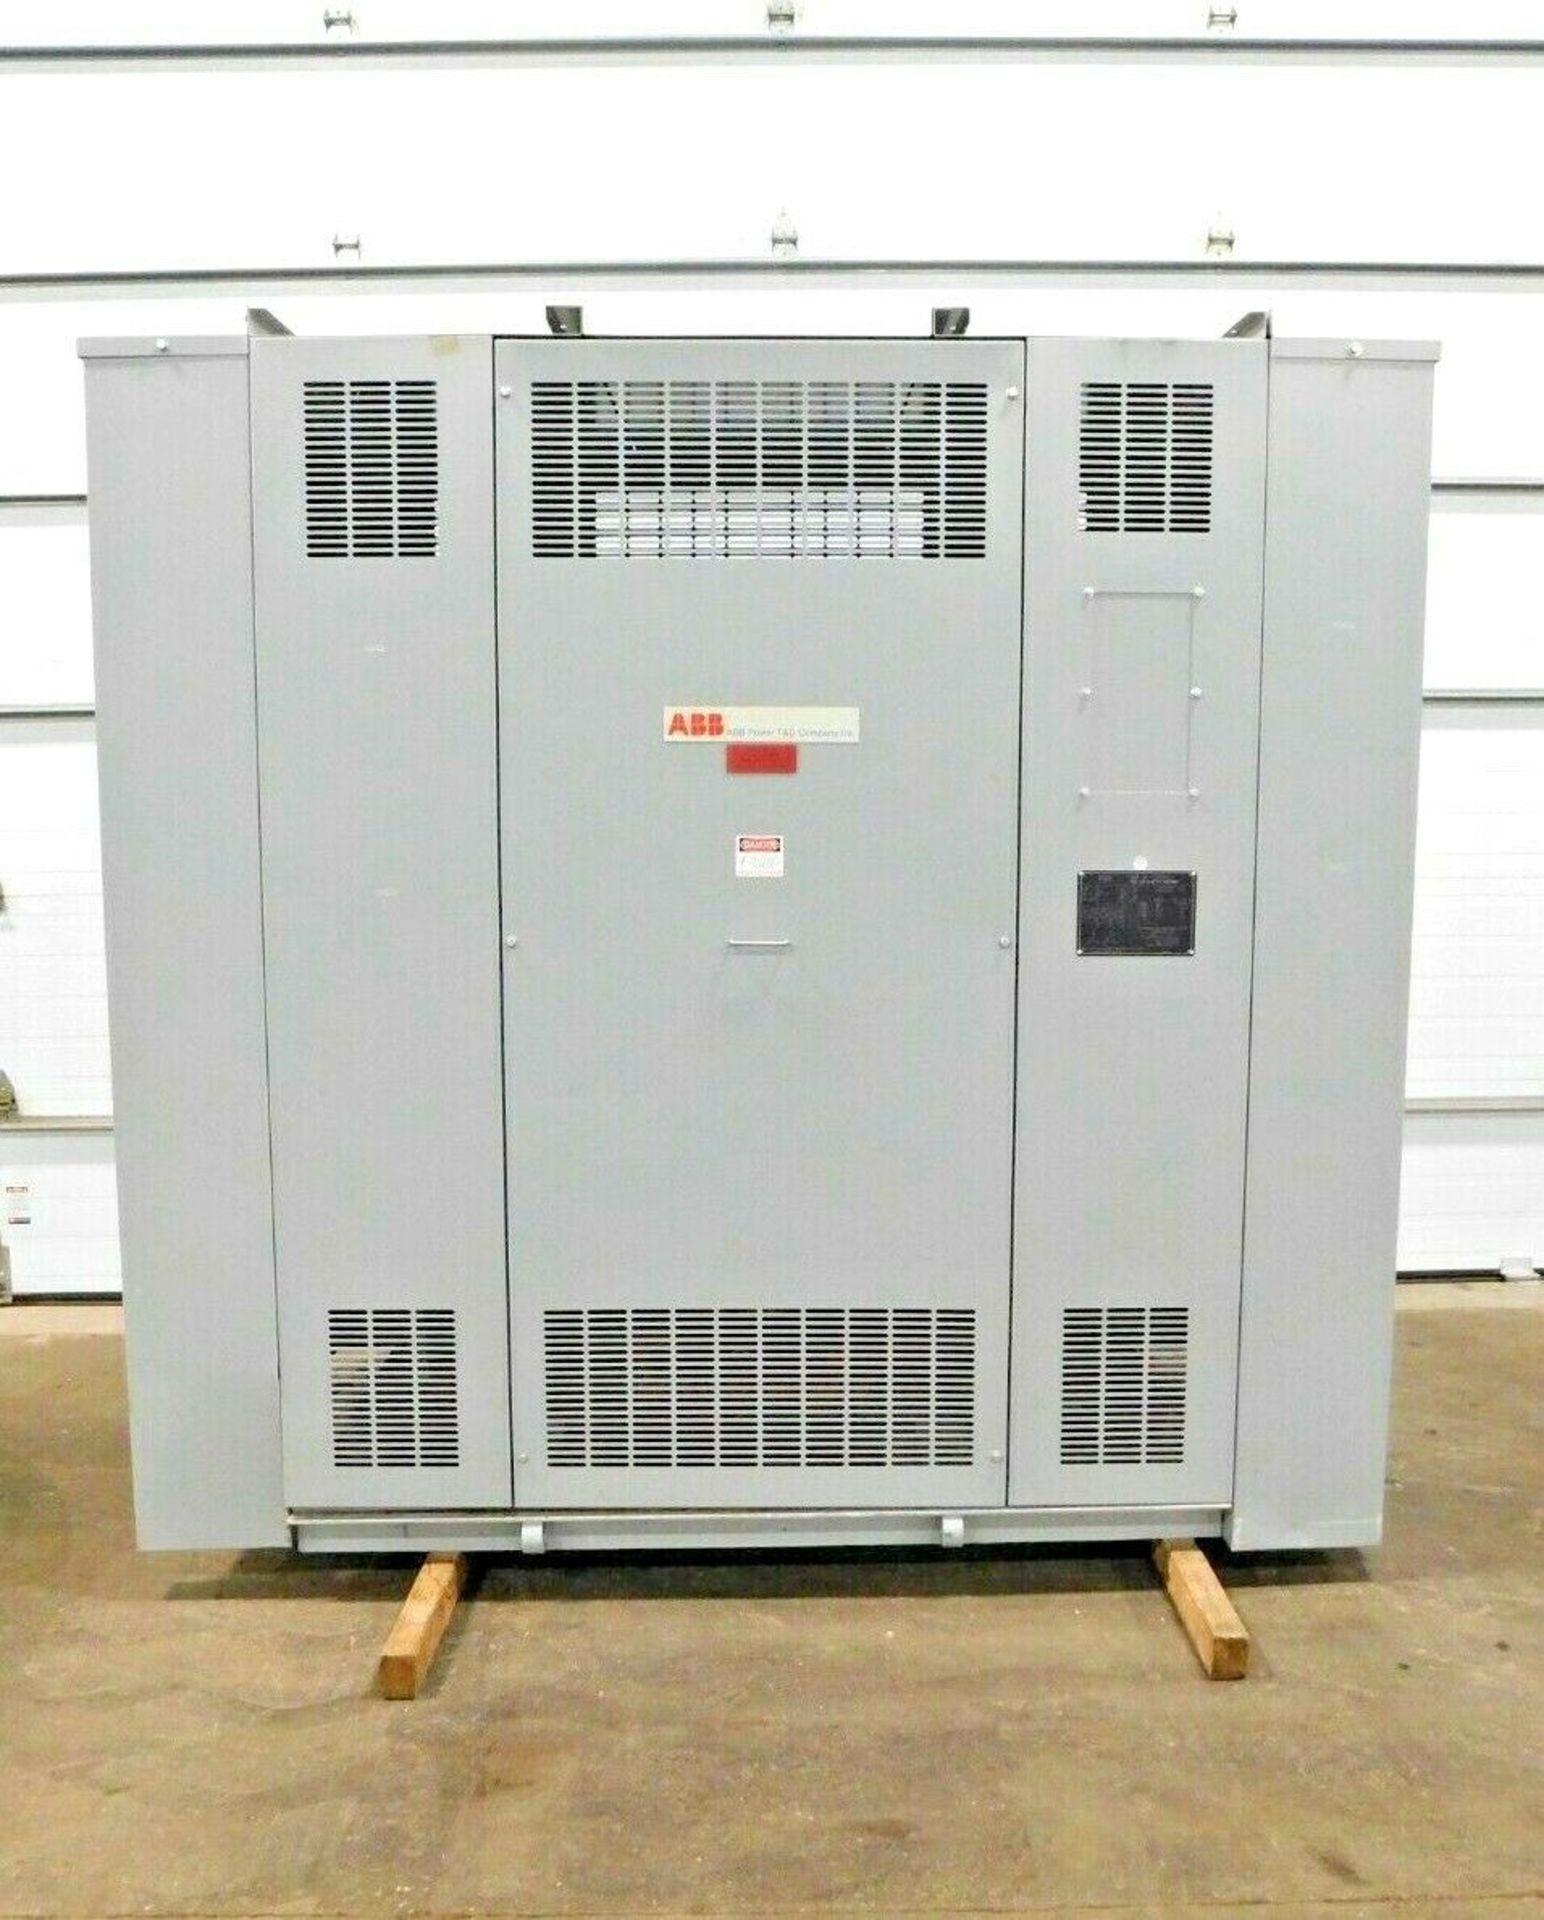 ABB 500 KVA Dry Type Transformer. 3 Ph. 4160 HV. 480 LV. 60 Hz.